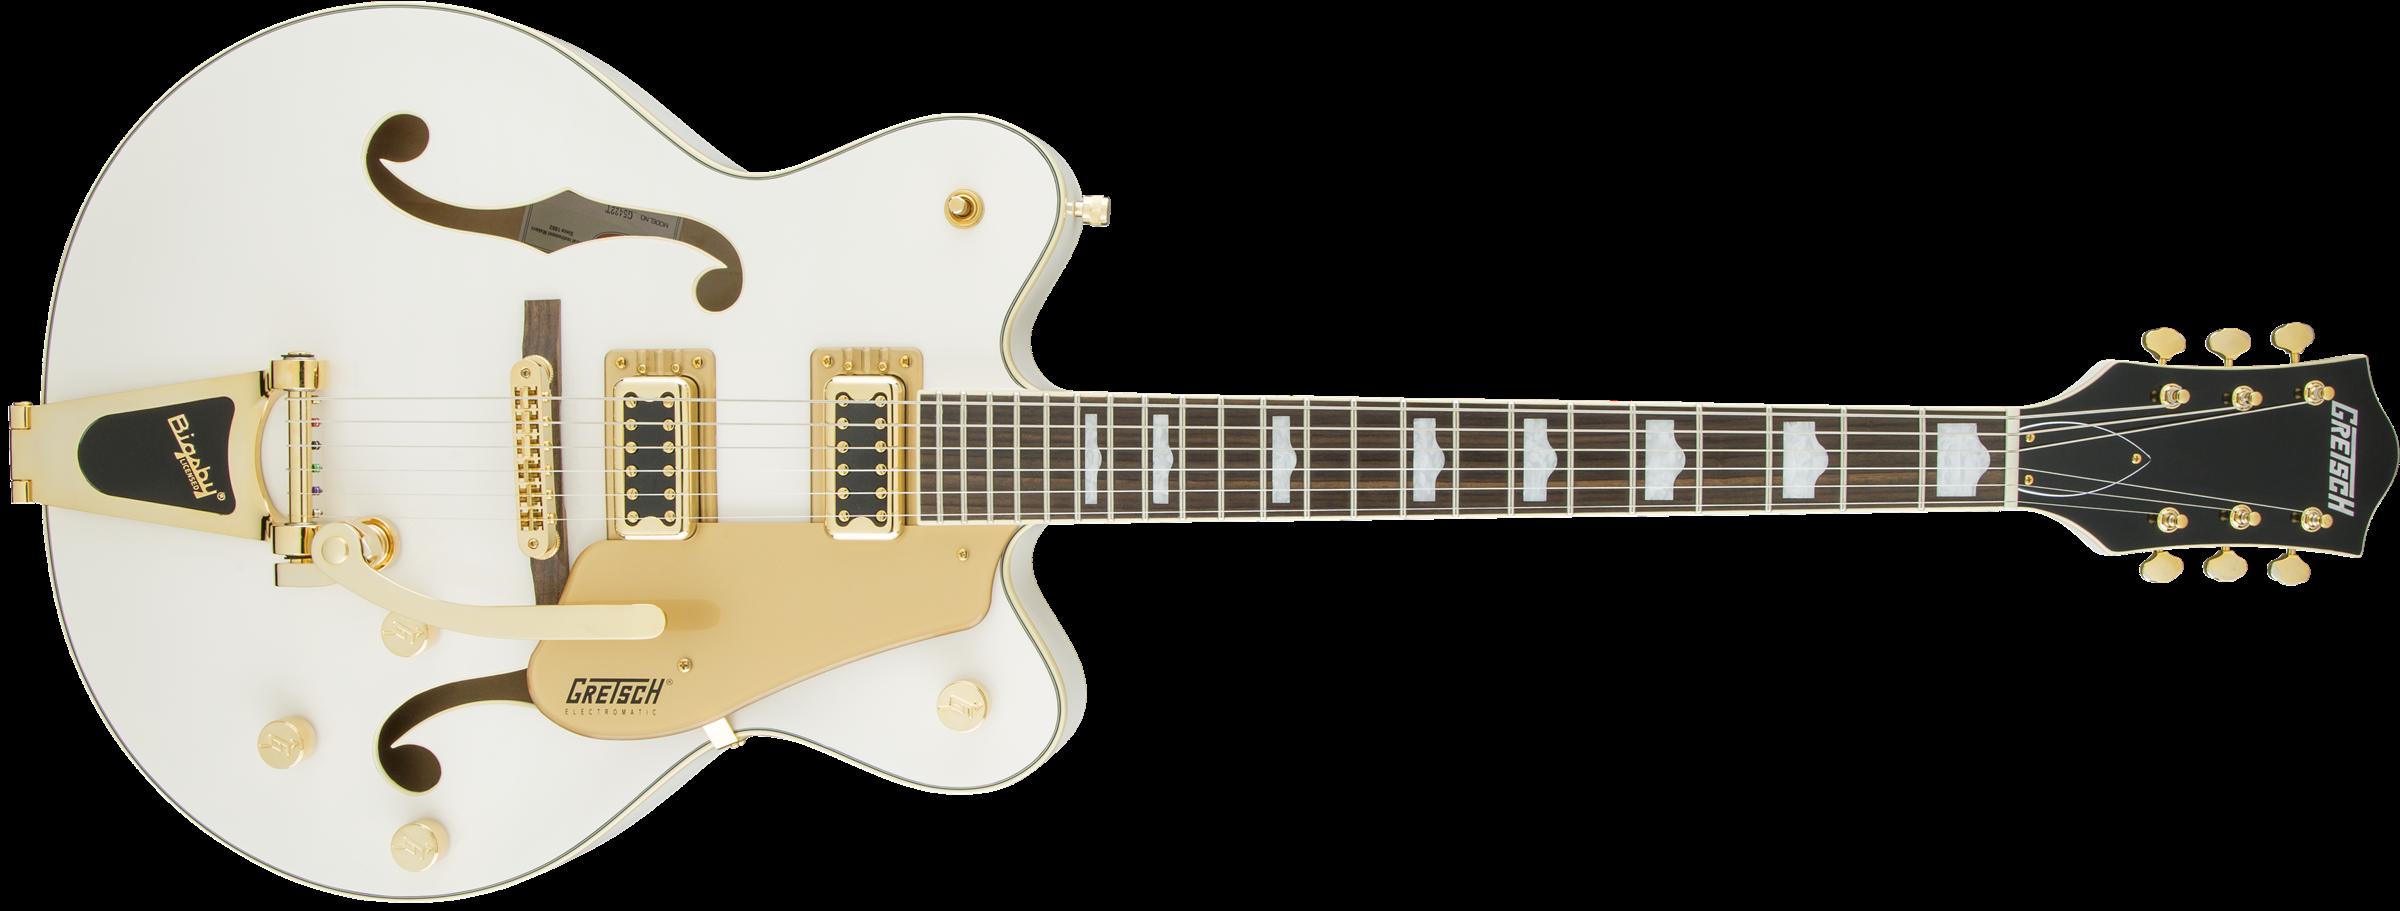 Gretsch G5422TG Electromatic Hollow body White Gold